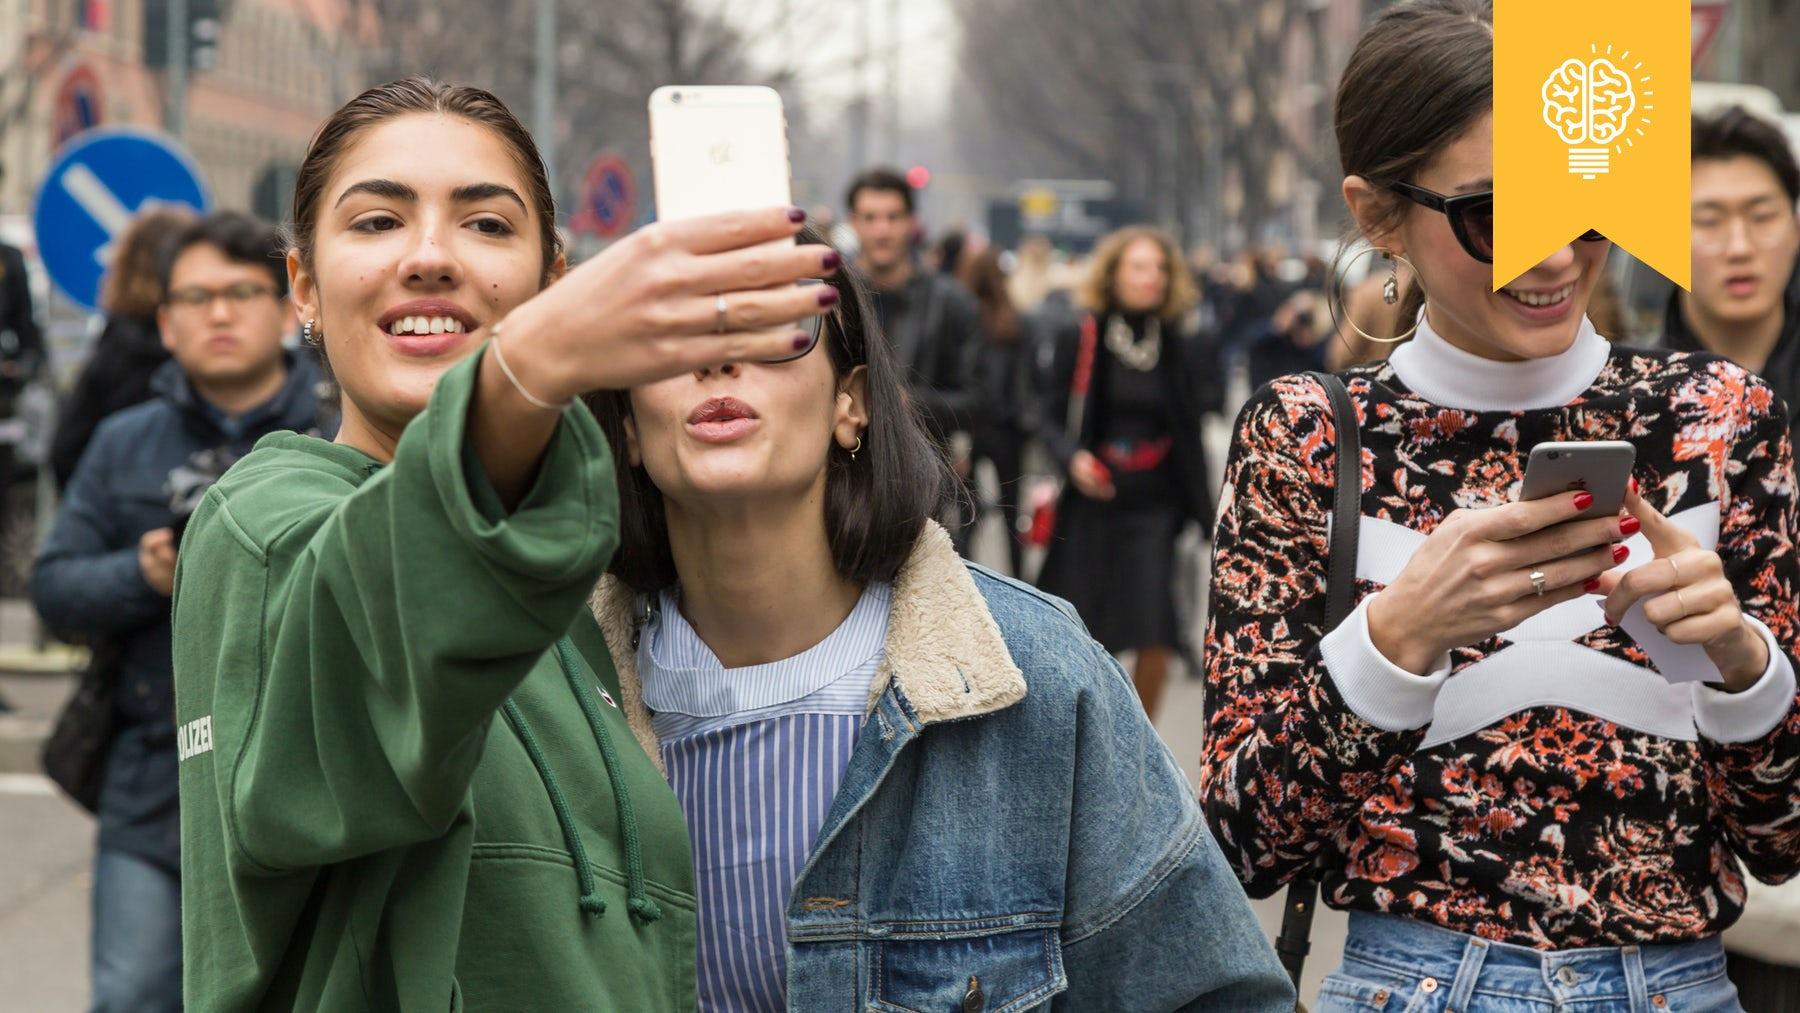 Influencers taking selfies in Milan | Source: Shutterstock